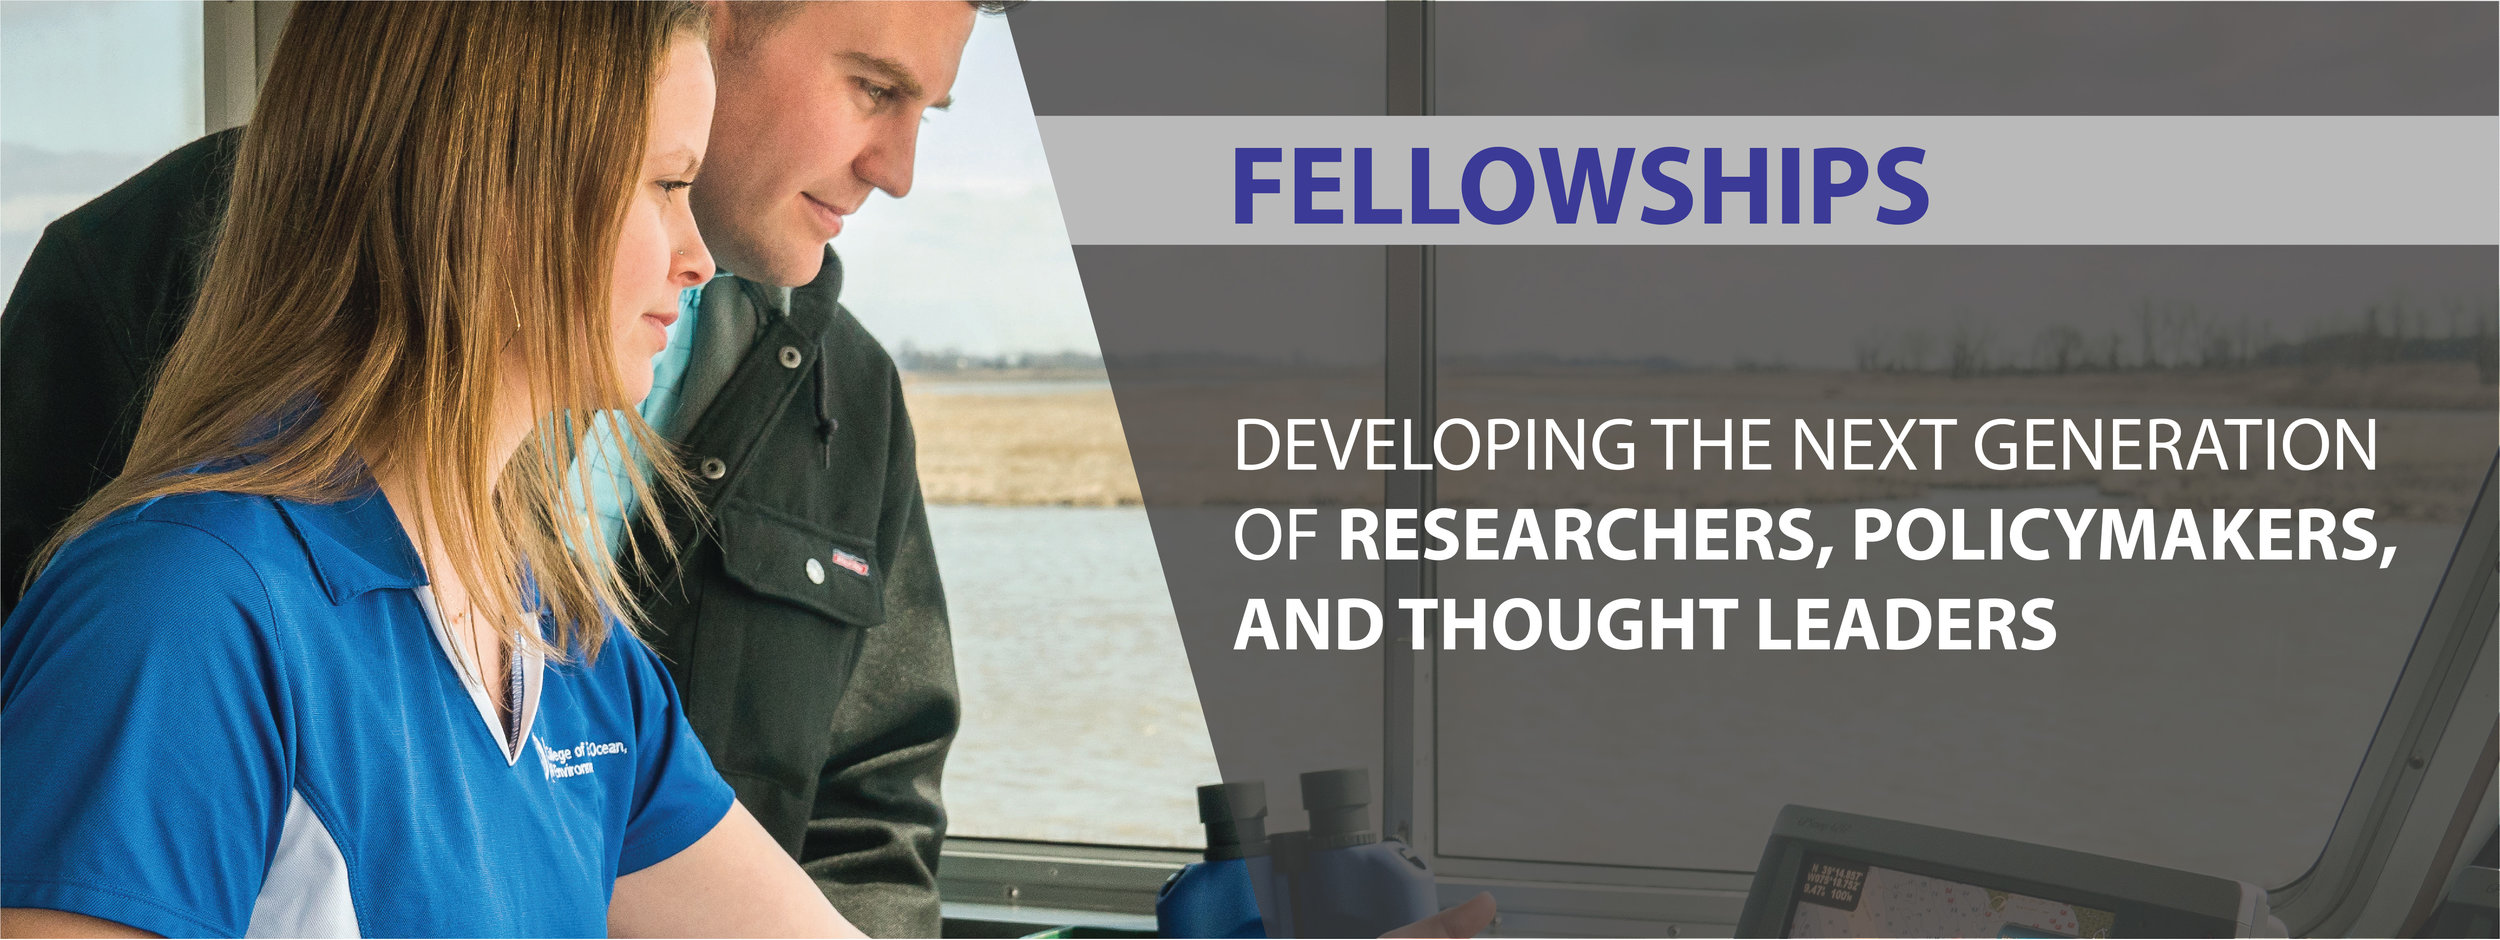 Fellowships Banner.jpg